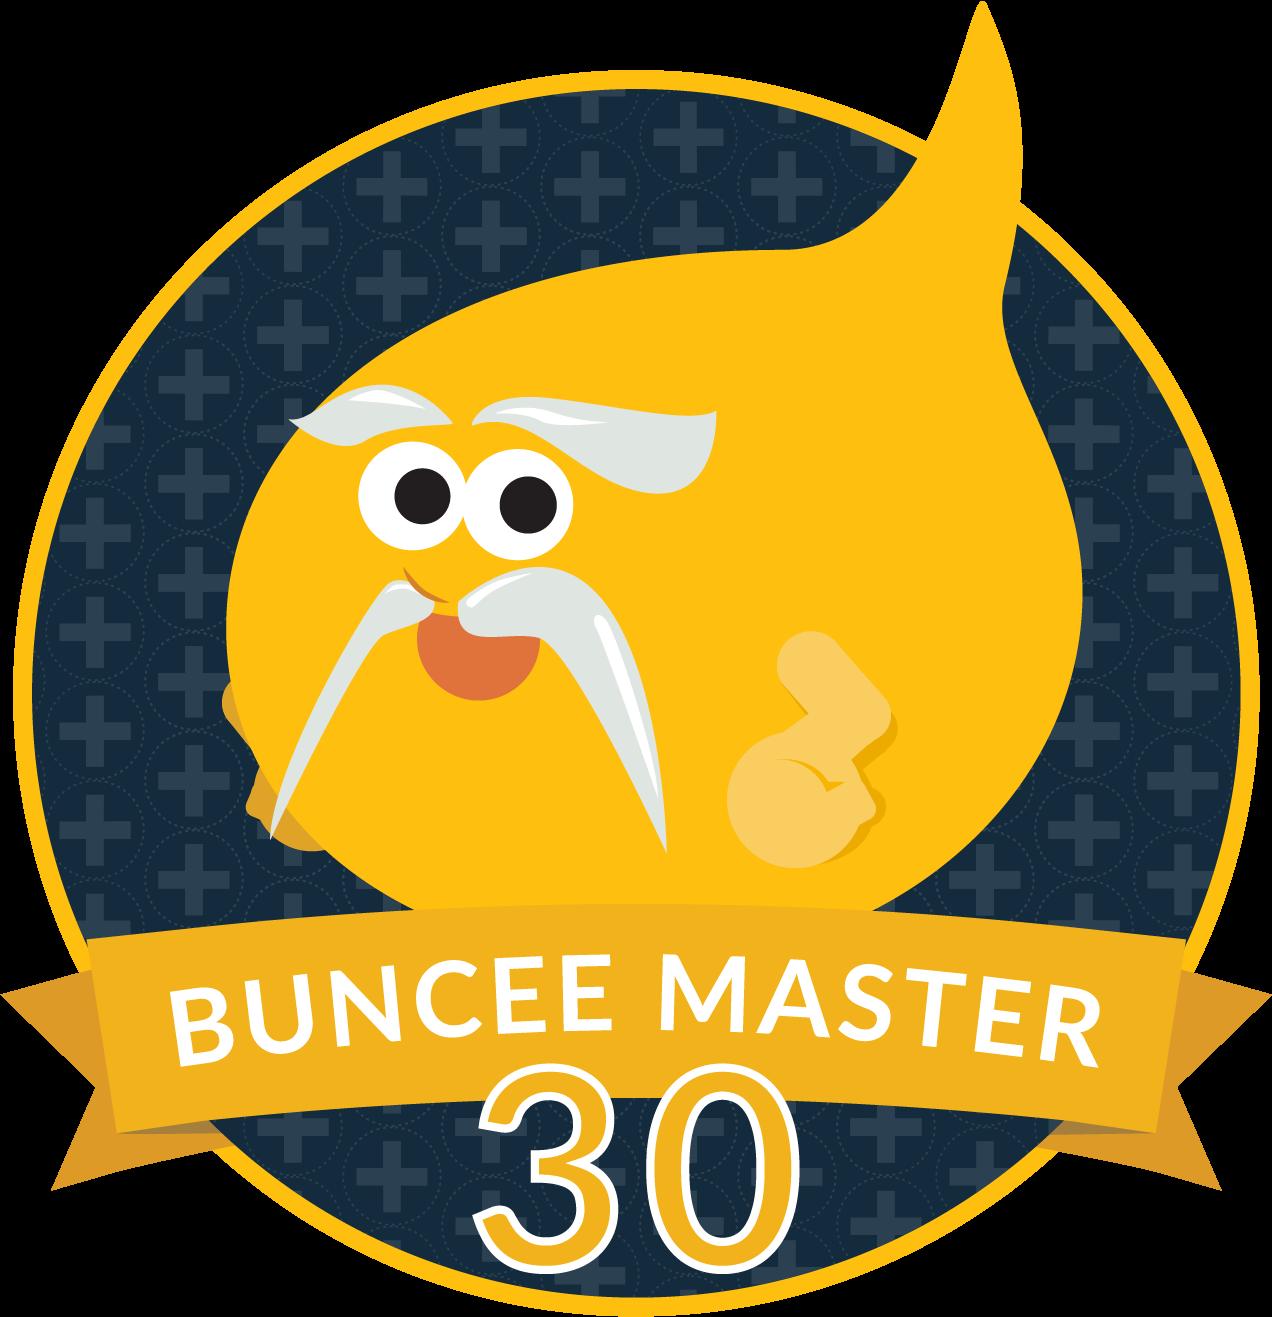 Buncee Master